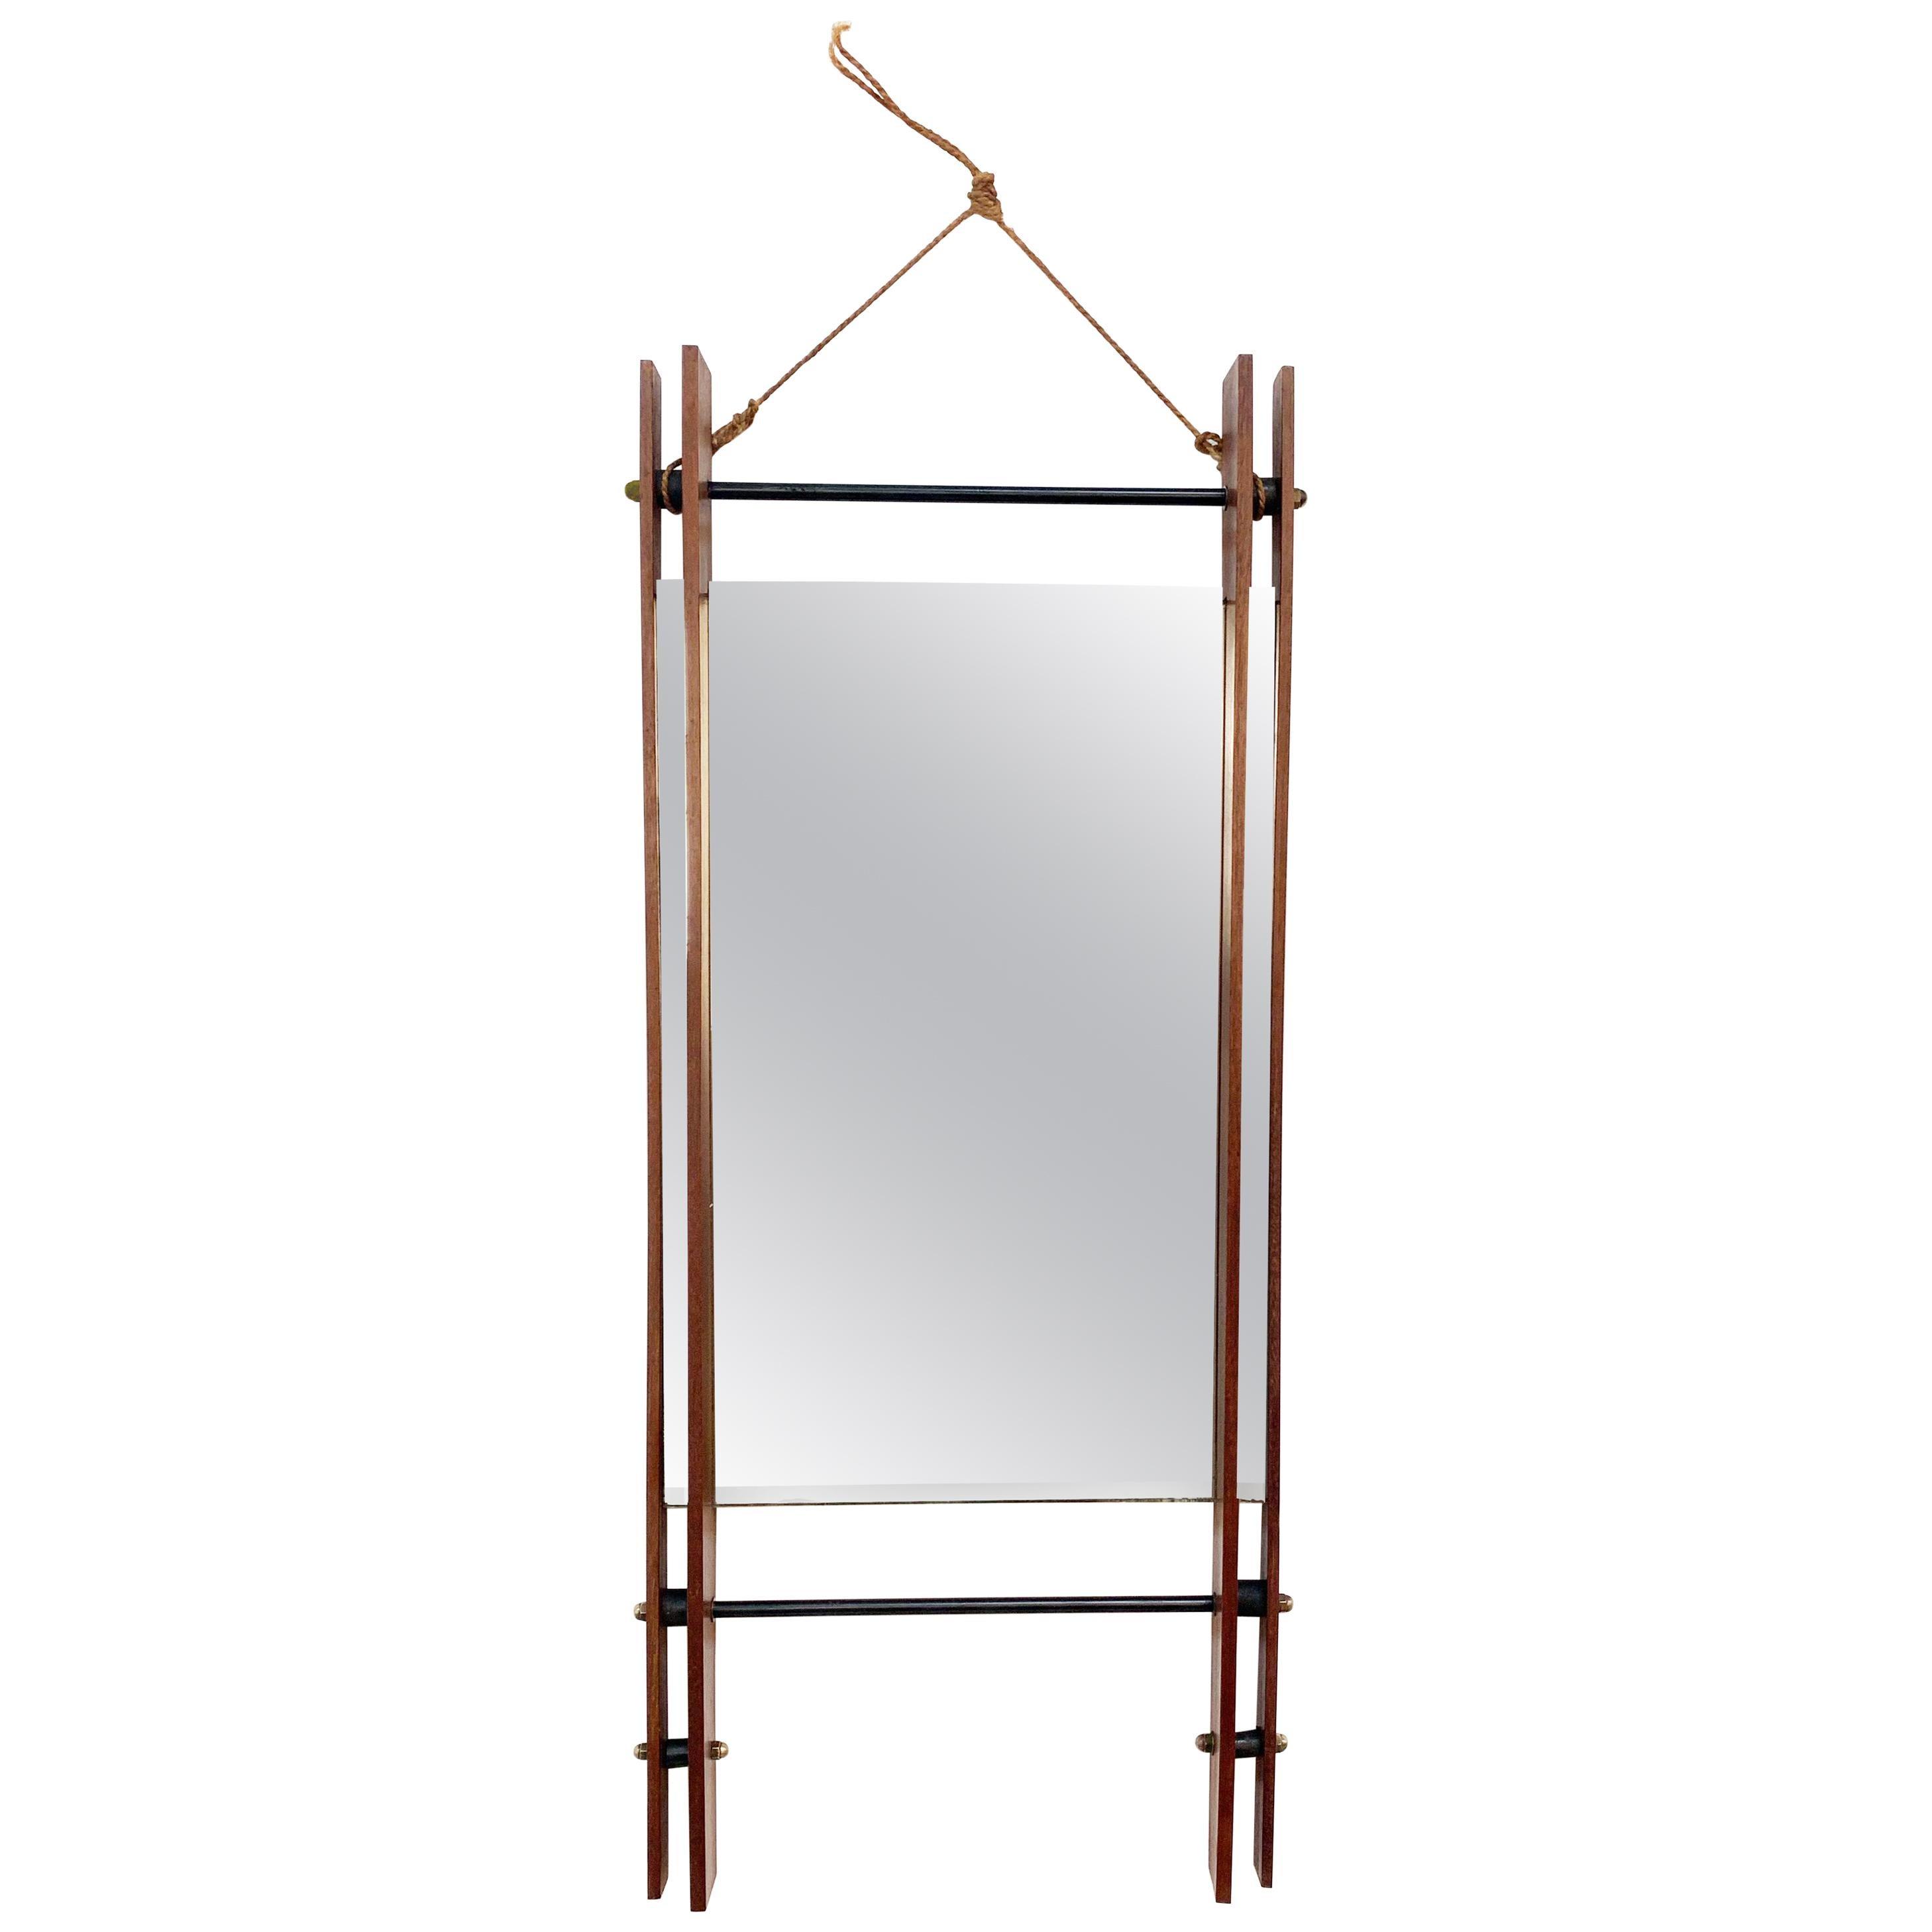 Rectangular Mirror with Double Teak Frame, Wall Mirror, Italy, 1950s